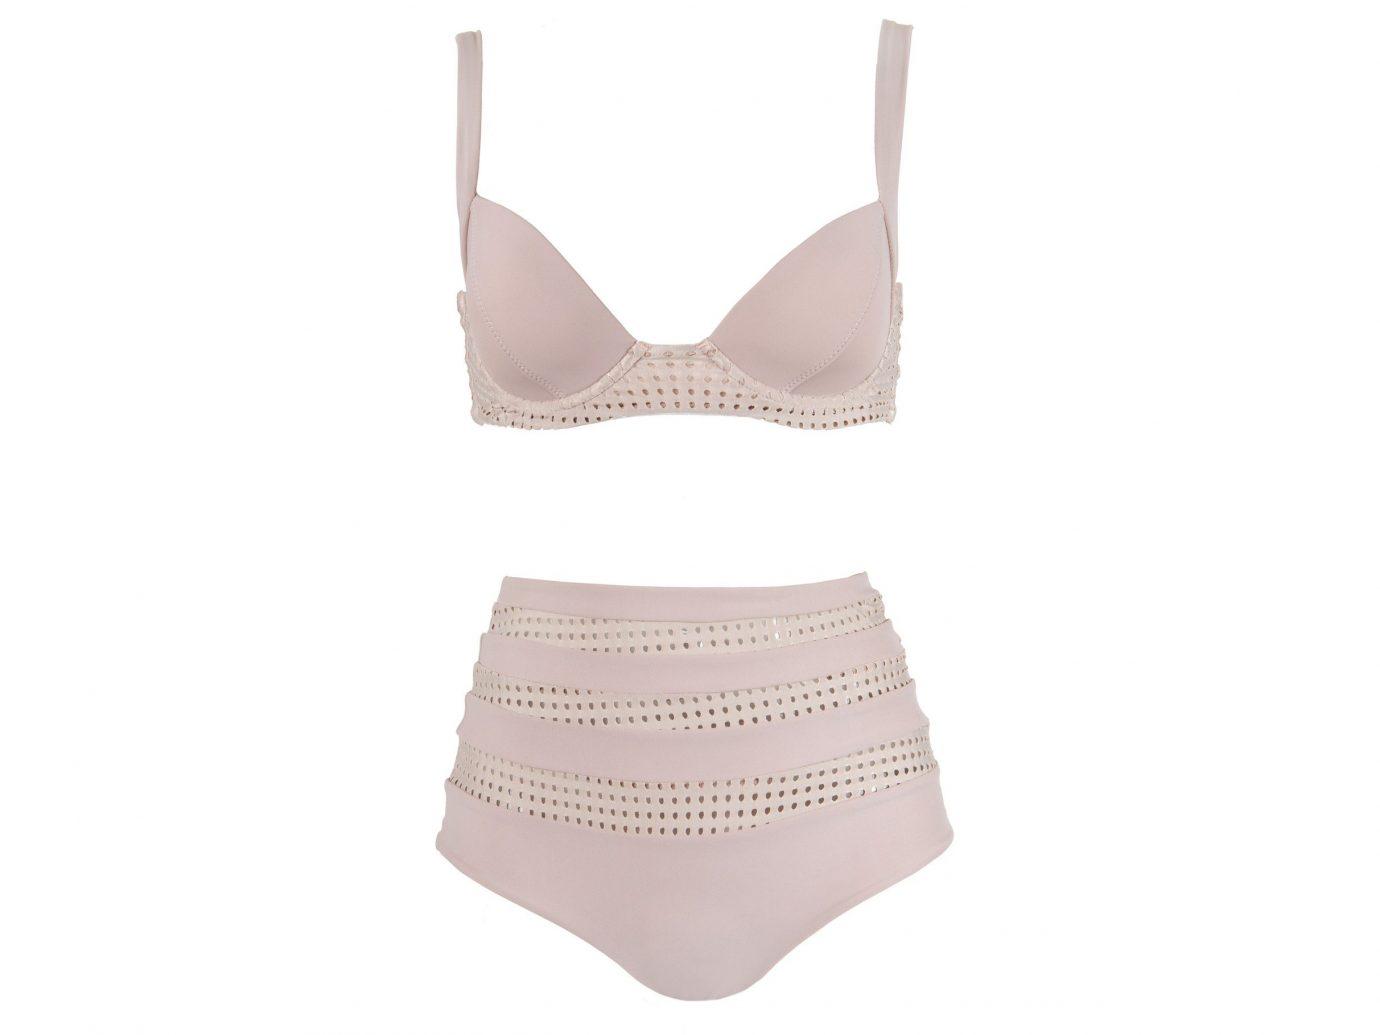 Style + Design clothing undergarment active undergarment lingerie brassiere pink briefs underpants maillot product swimwear lingerie top textile abdomen beige pattern